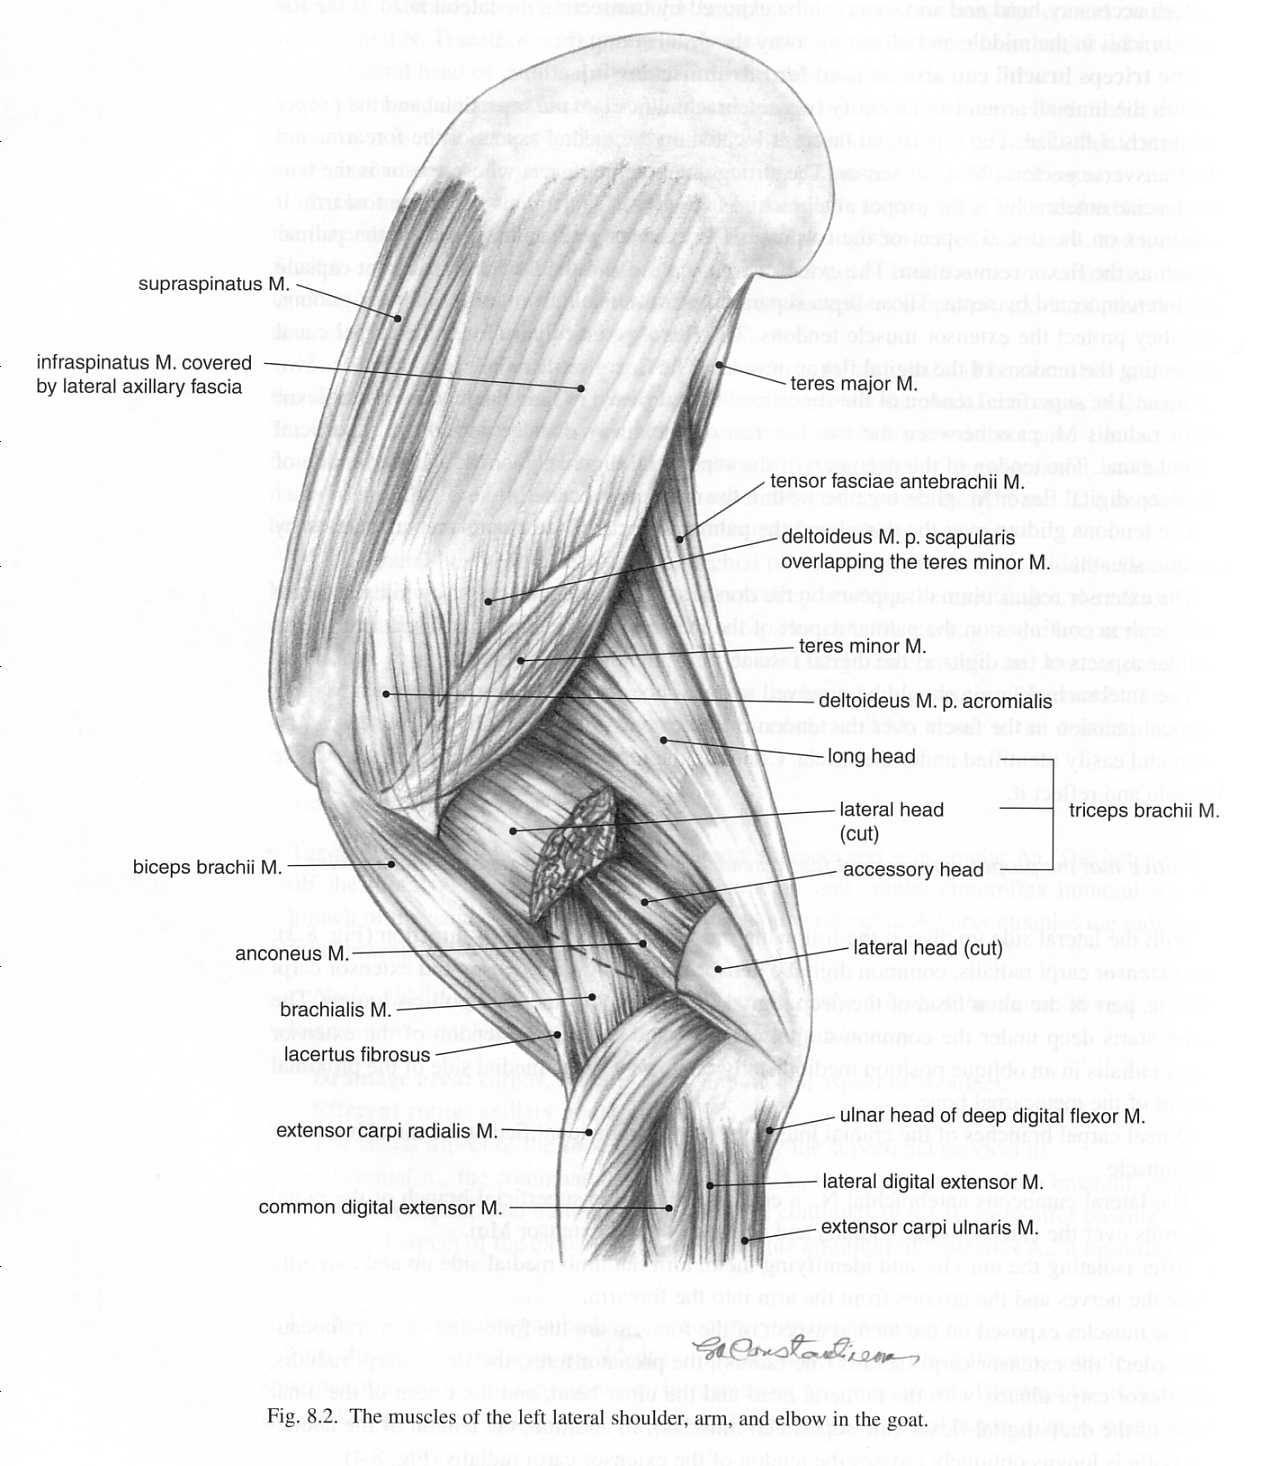 Goat Leg Muscles Image9